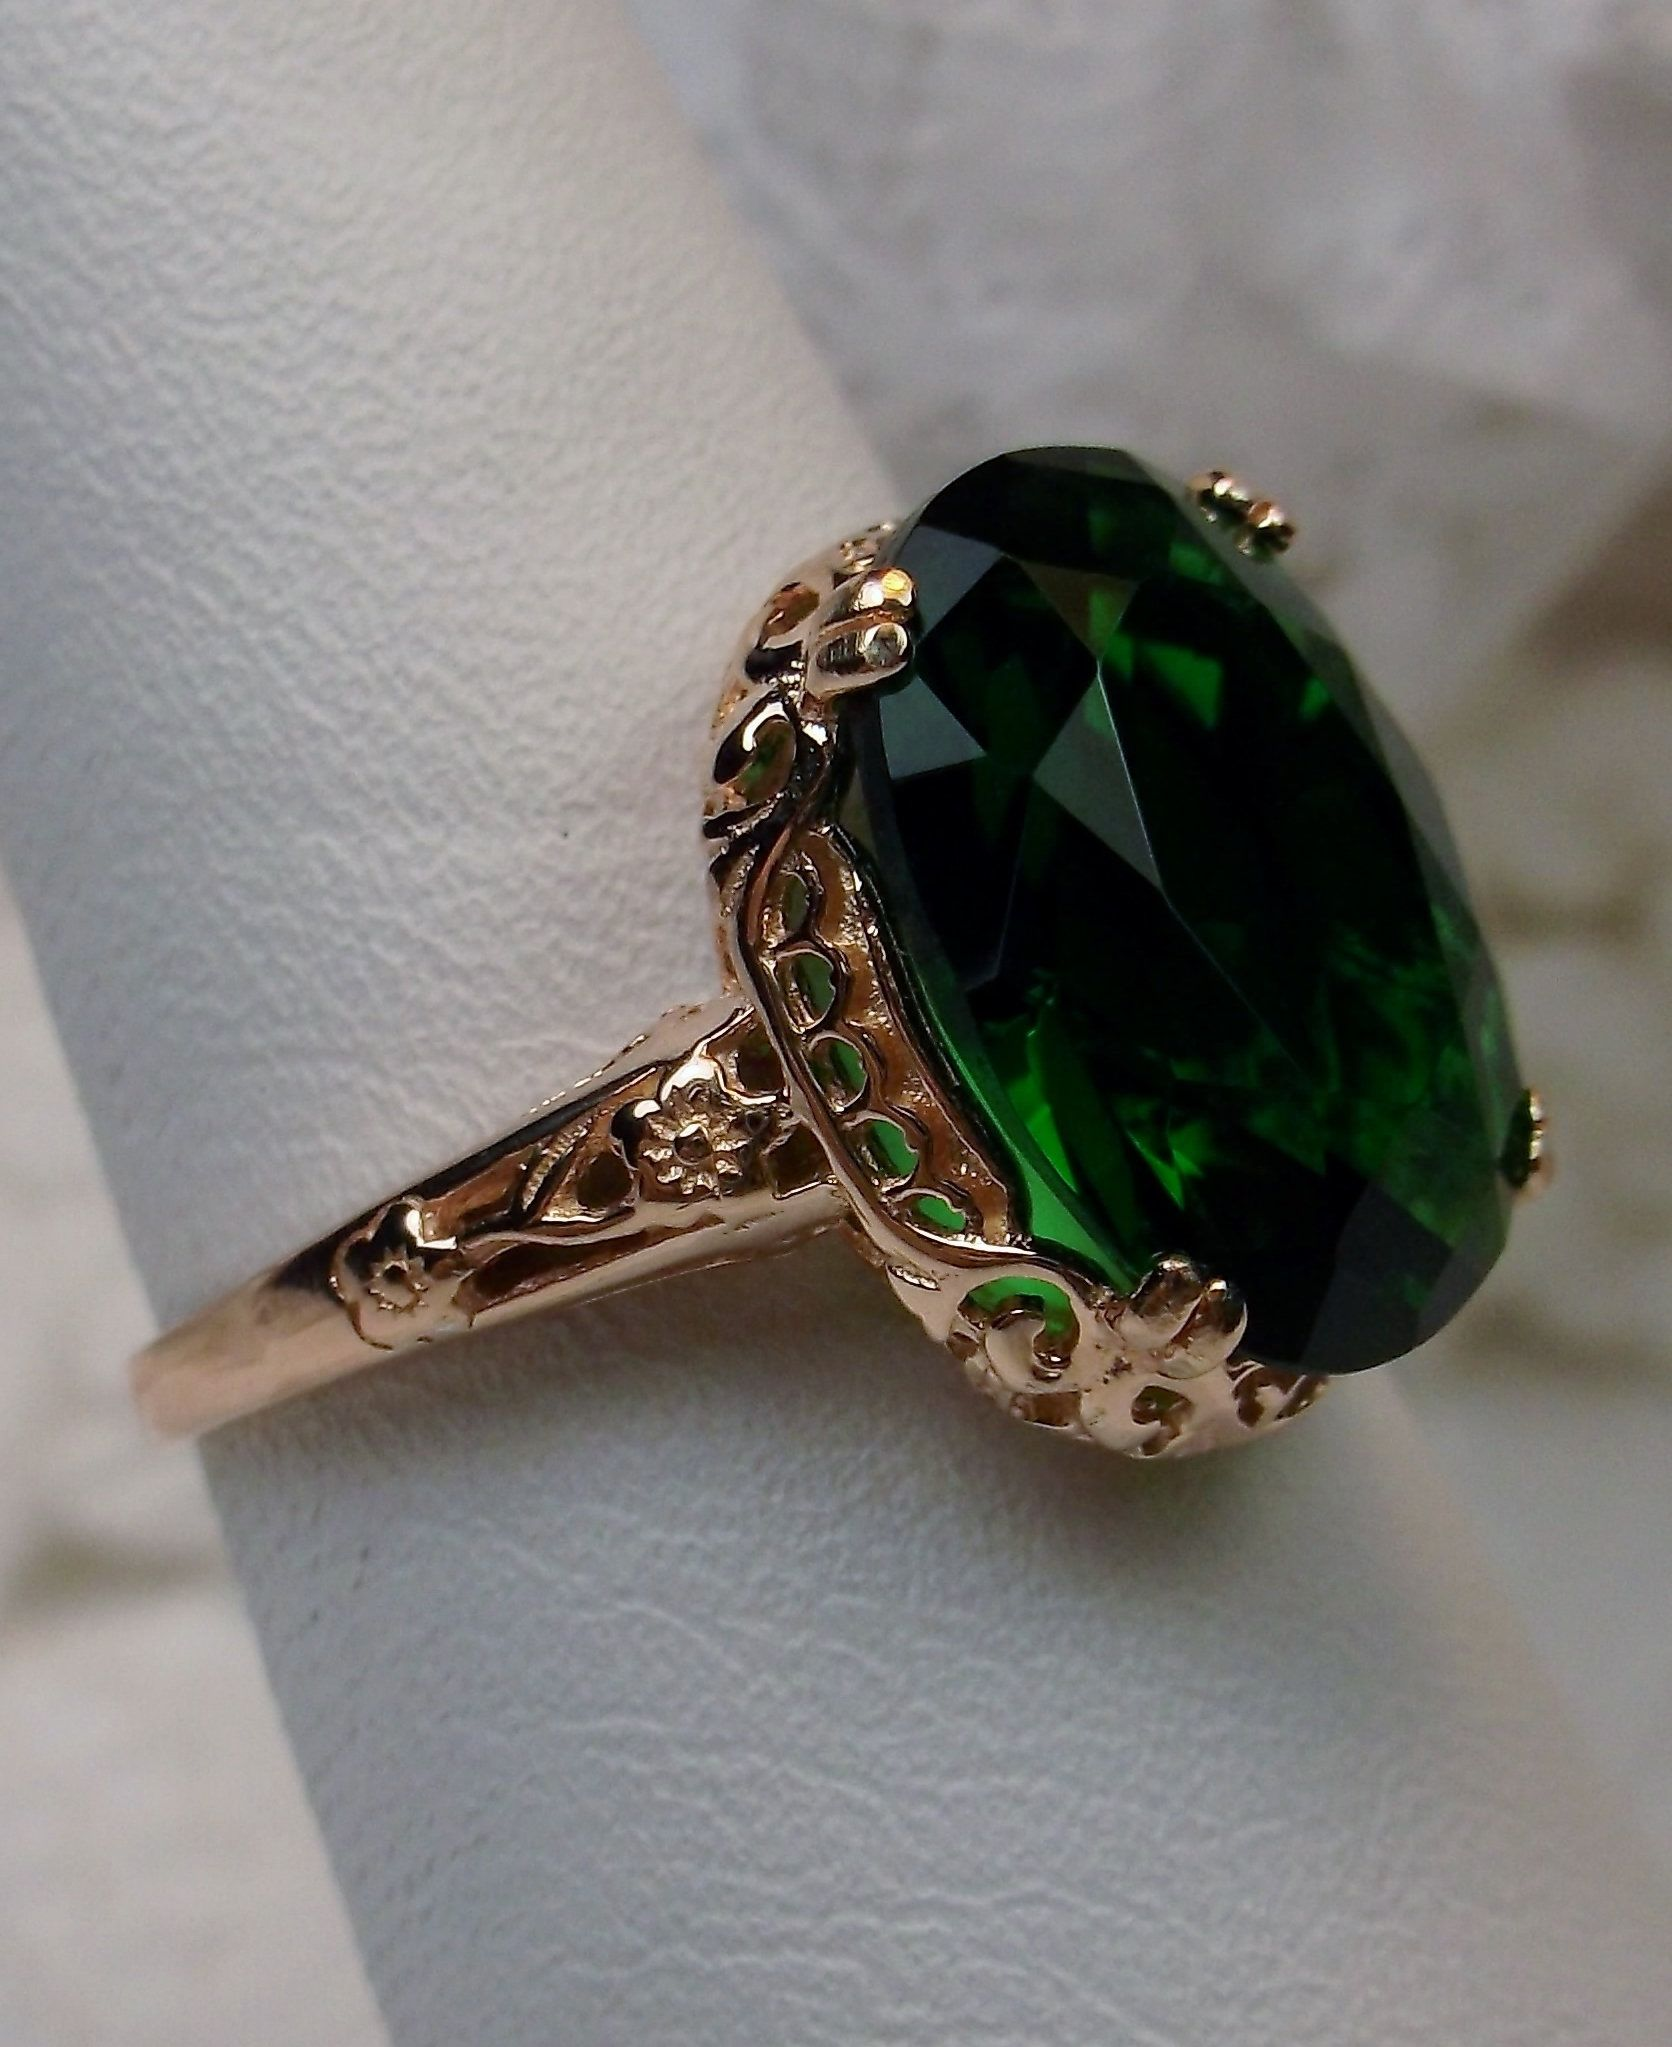 Lab Synthetic Green Emerald Gemstone Solid 10k Rose Gold Edwardian Design Motif Filigree Antique Filigree Jewelry Edwardian Jewelry Blue Topaz Sterling Silver